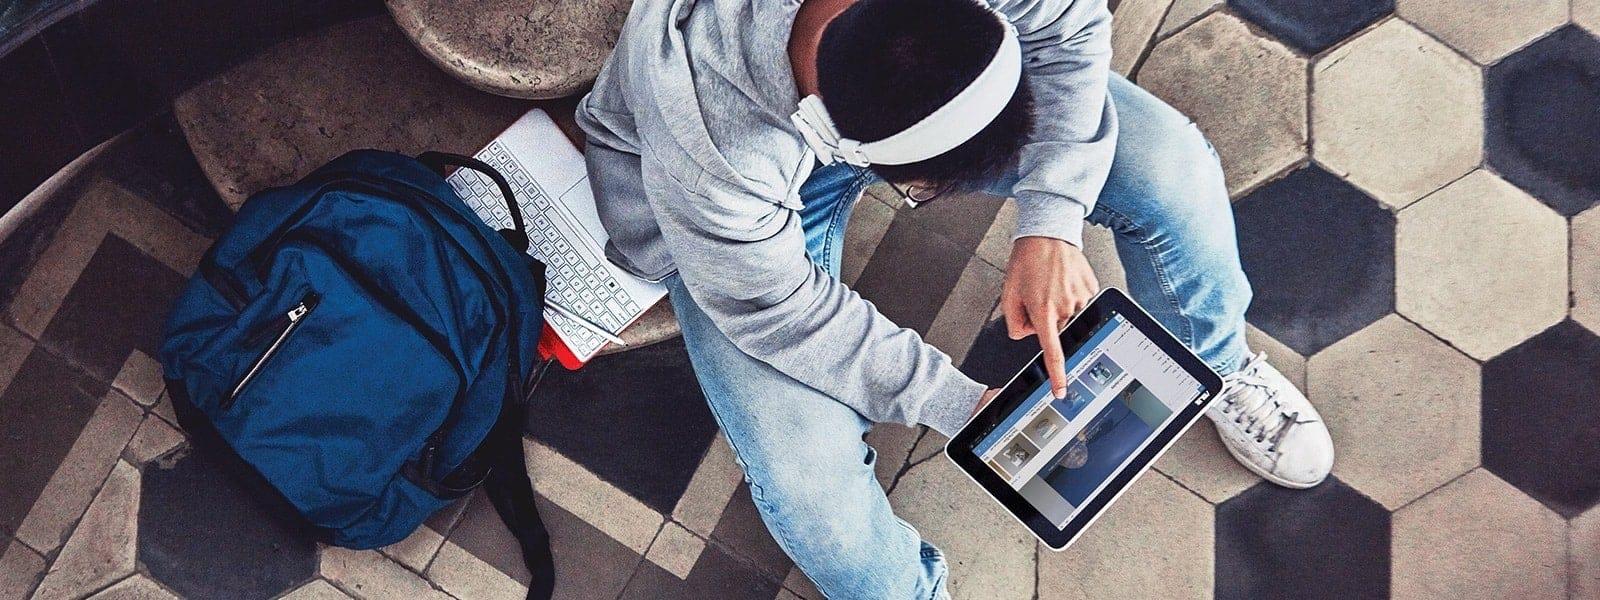 Schüler mit Windows 10-Gerät